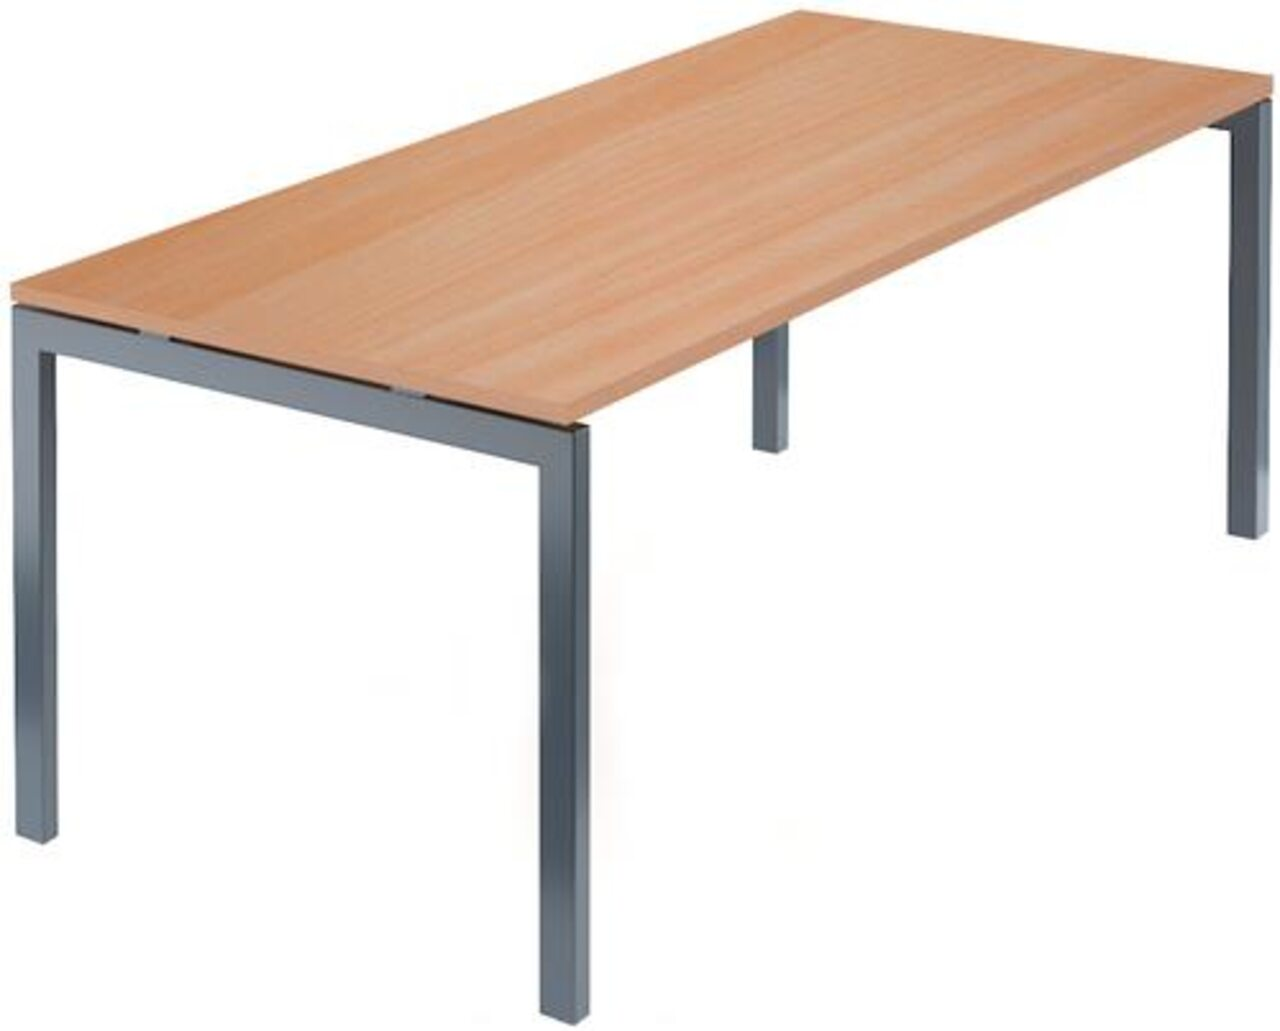 Стол на м/каркасе для заседаний/антрацит Арго 180x85x76 - фото 2